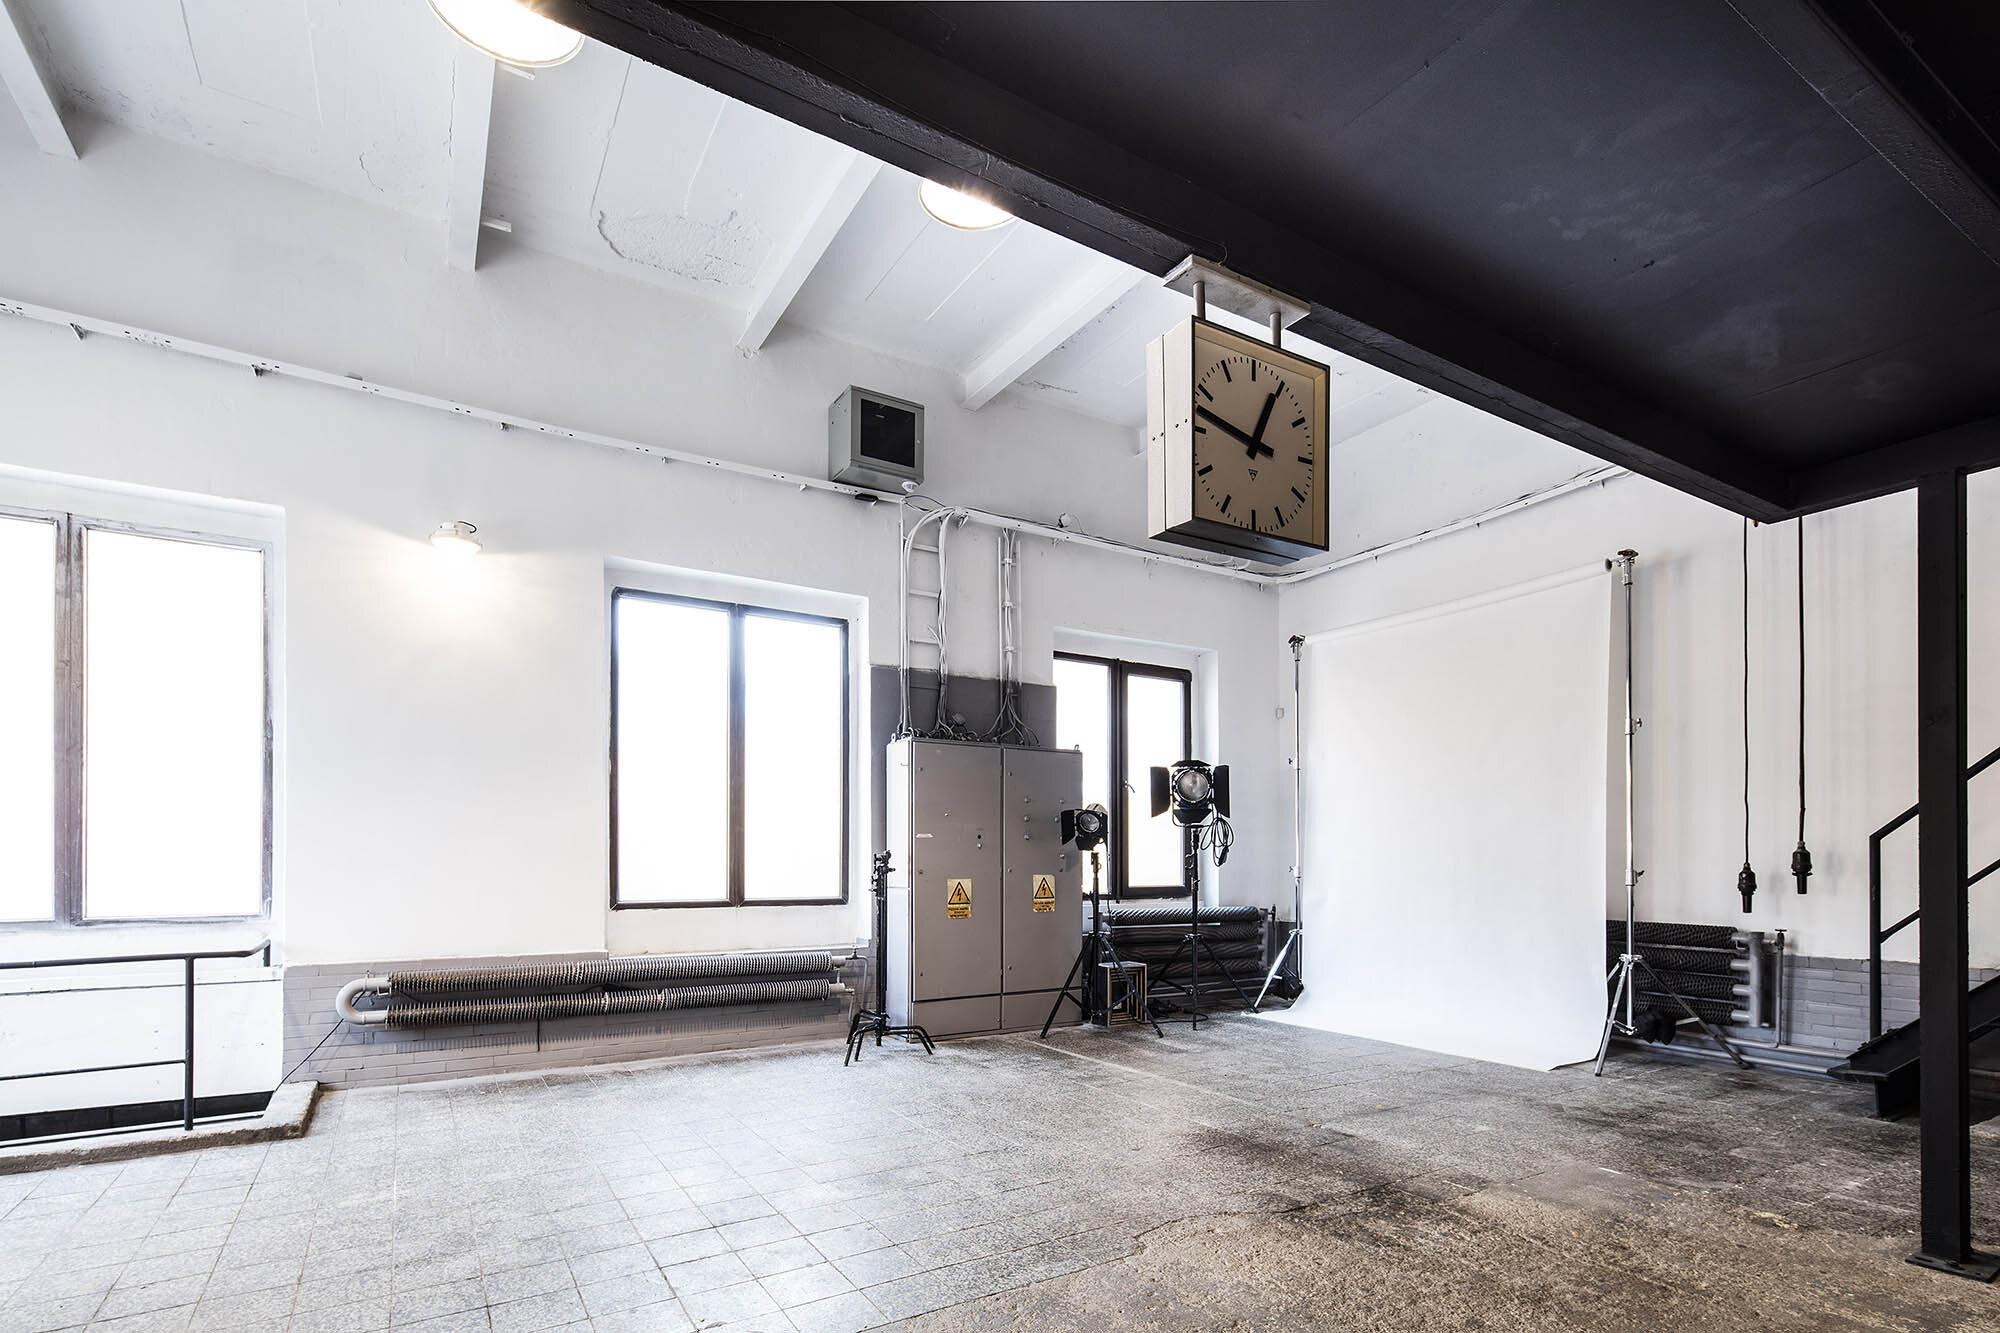 Studio Dvojka (1)-8.jpg